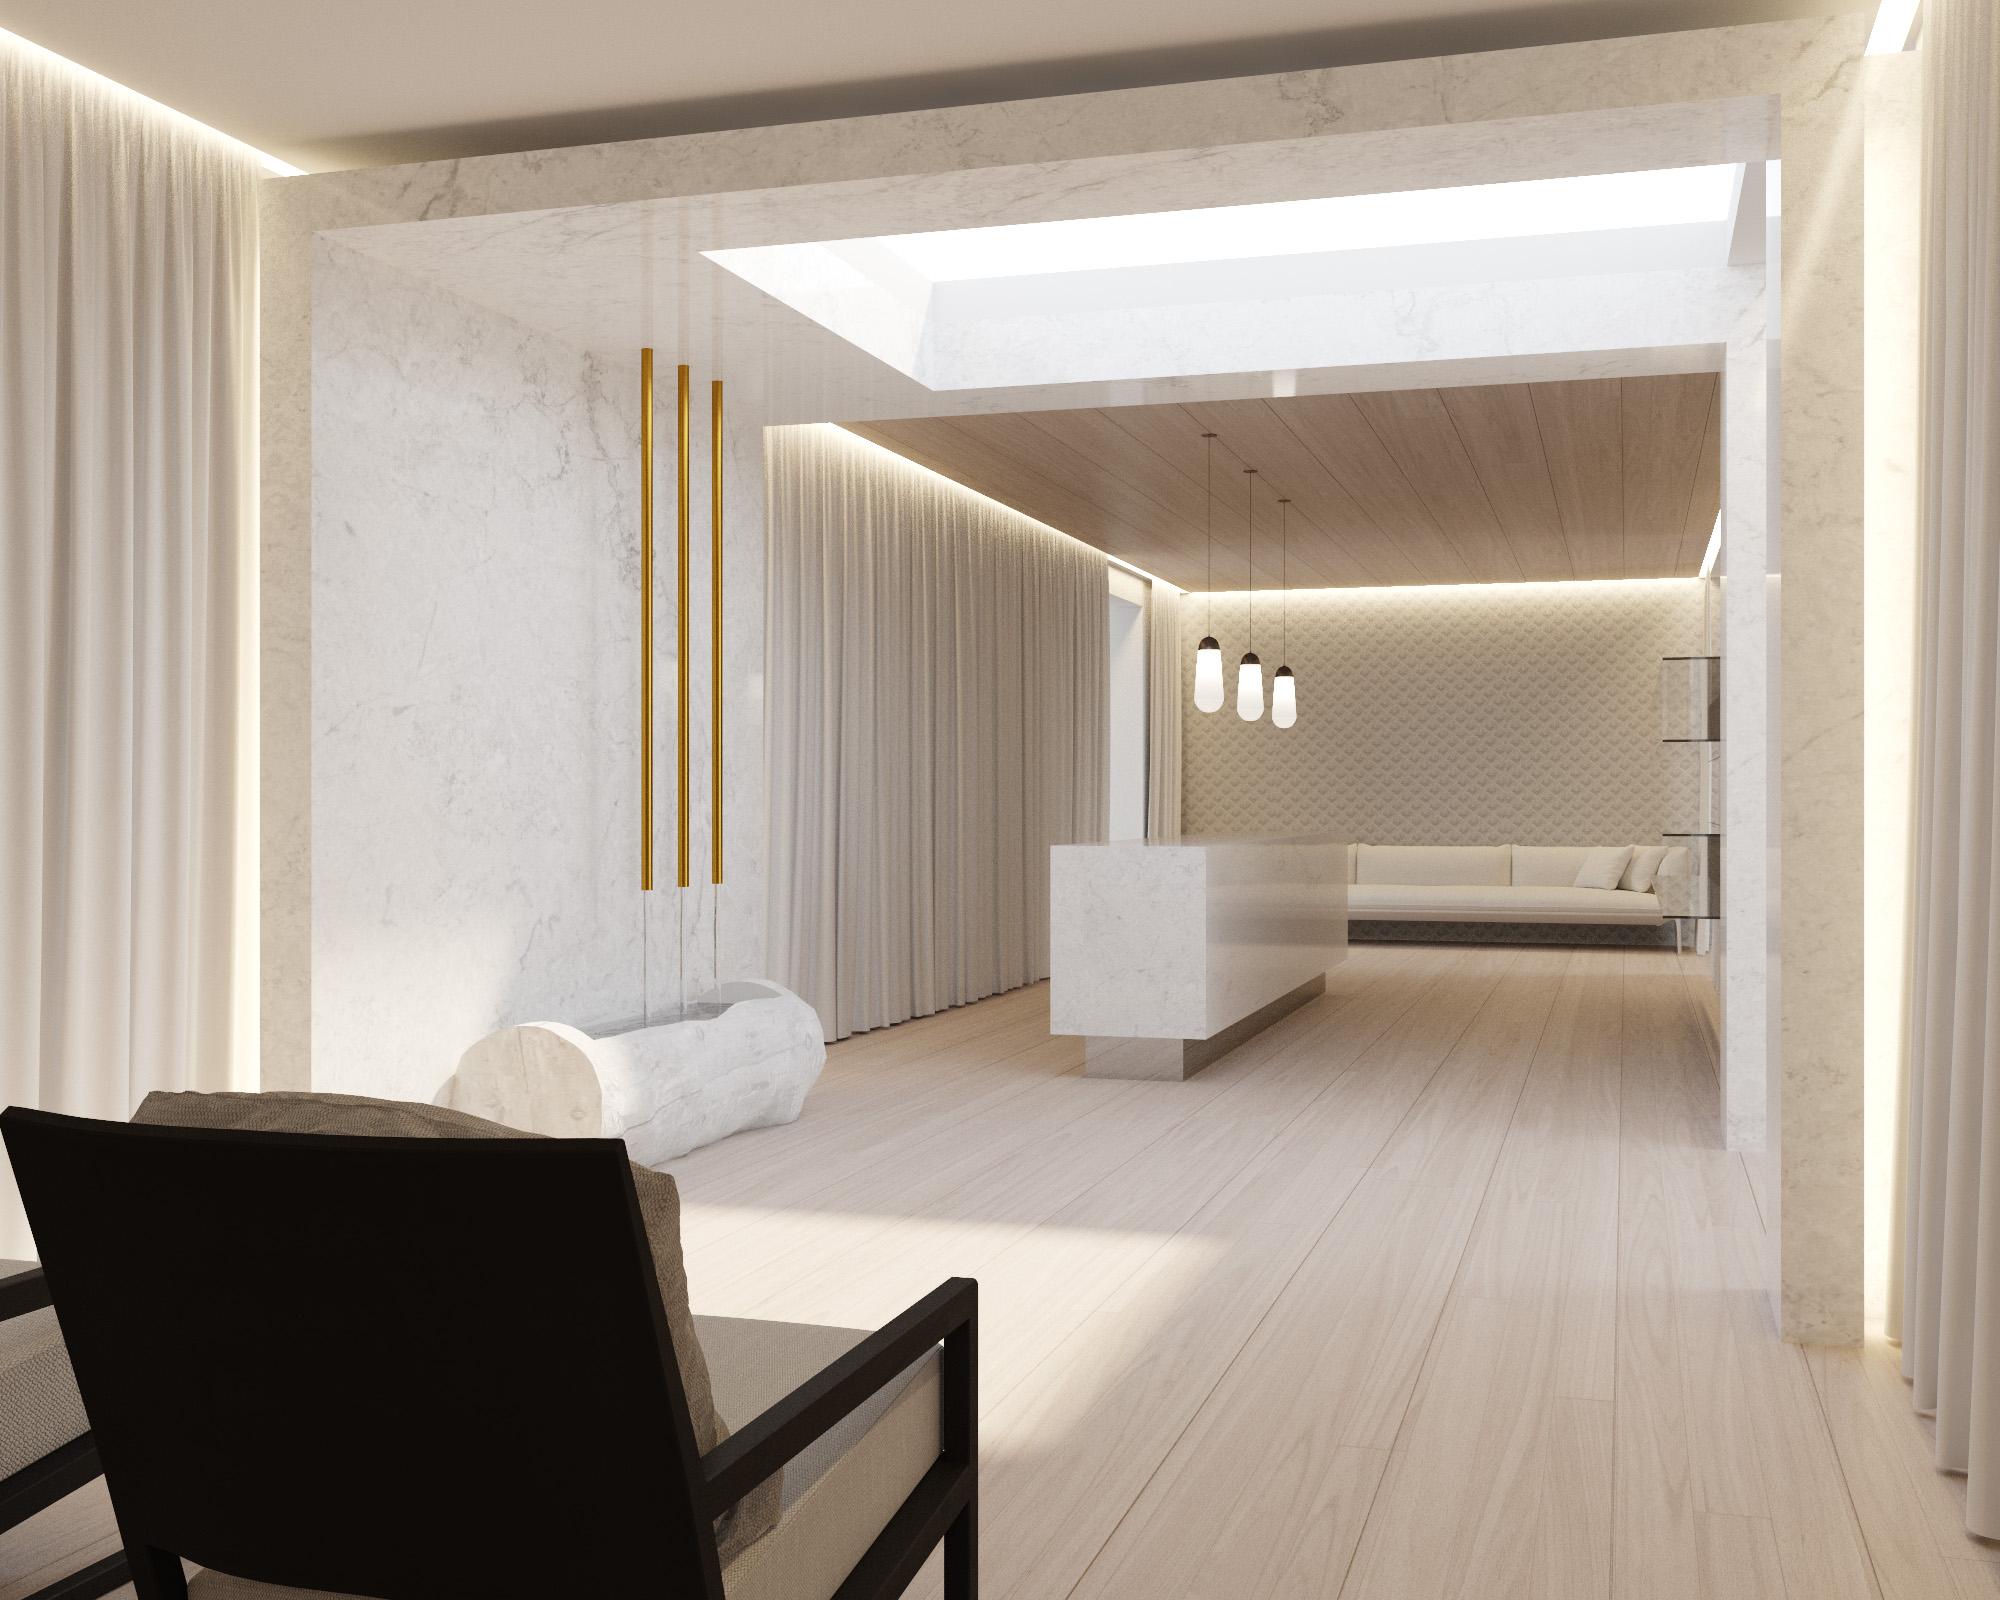 Prix d une v randa de 30 m2 for Prix moyen d une veranda au m2